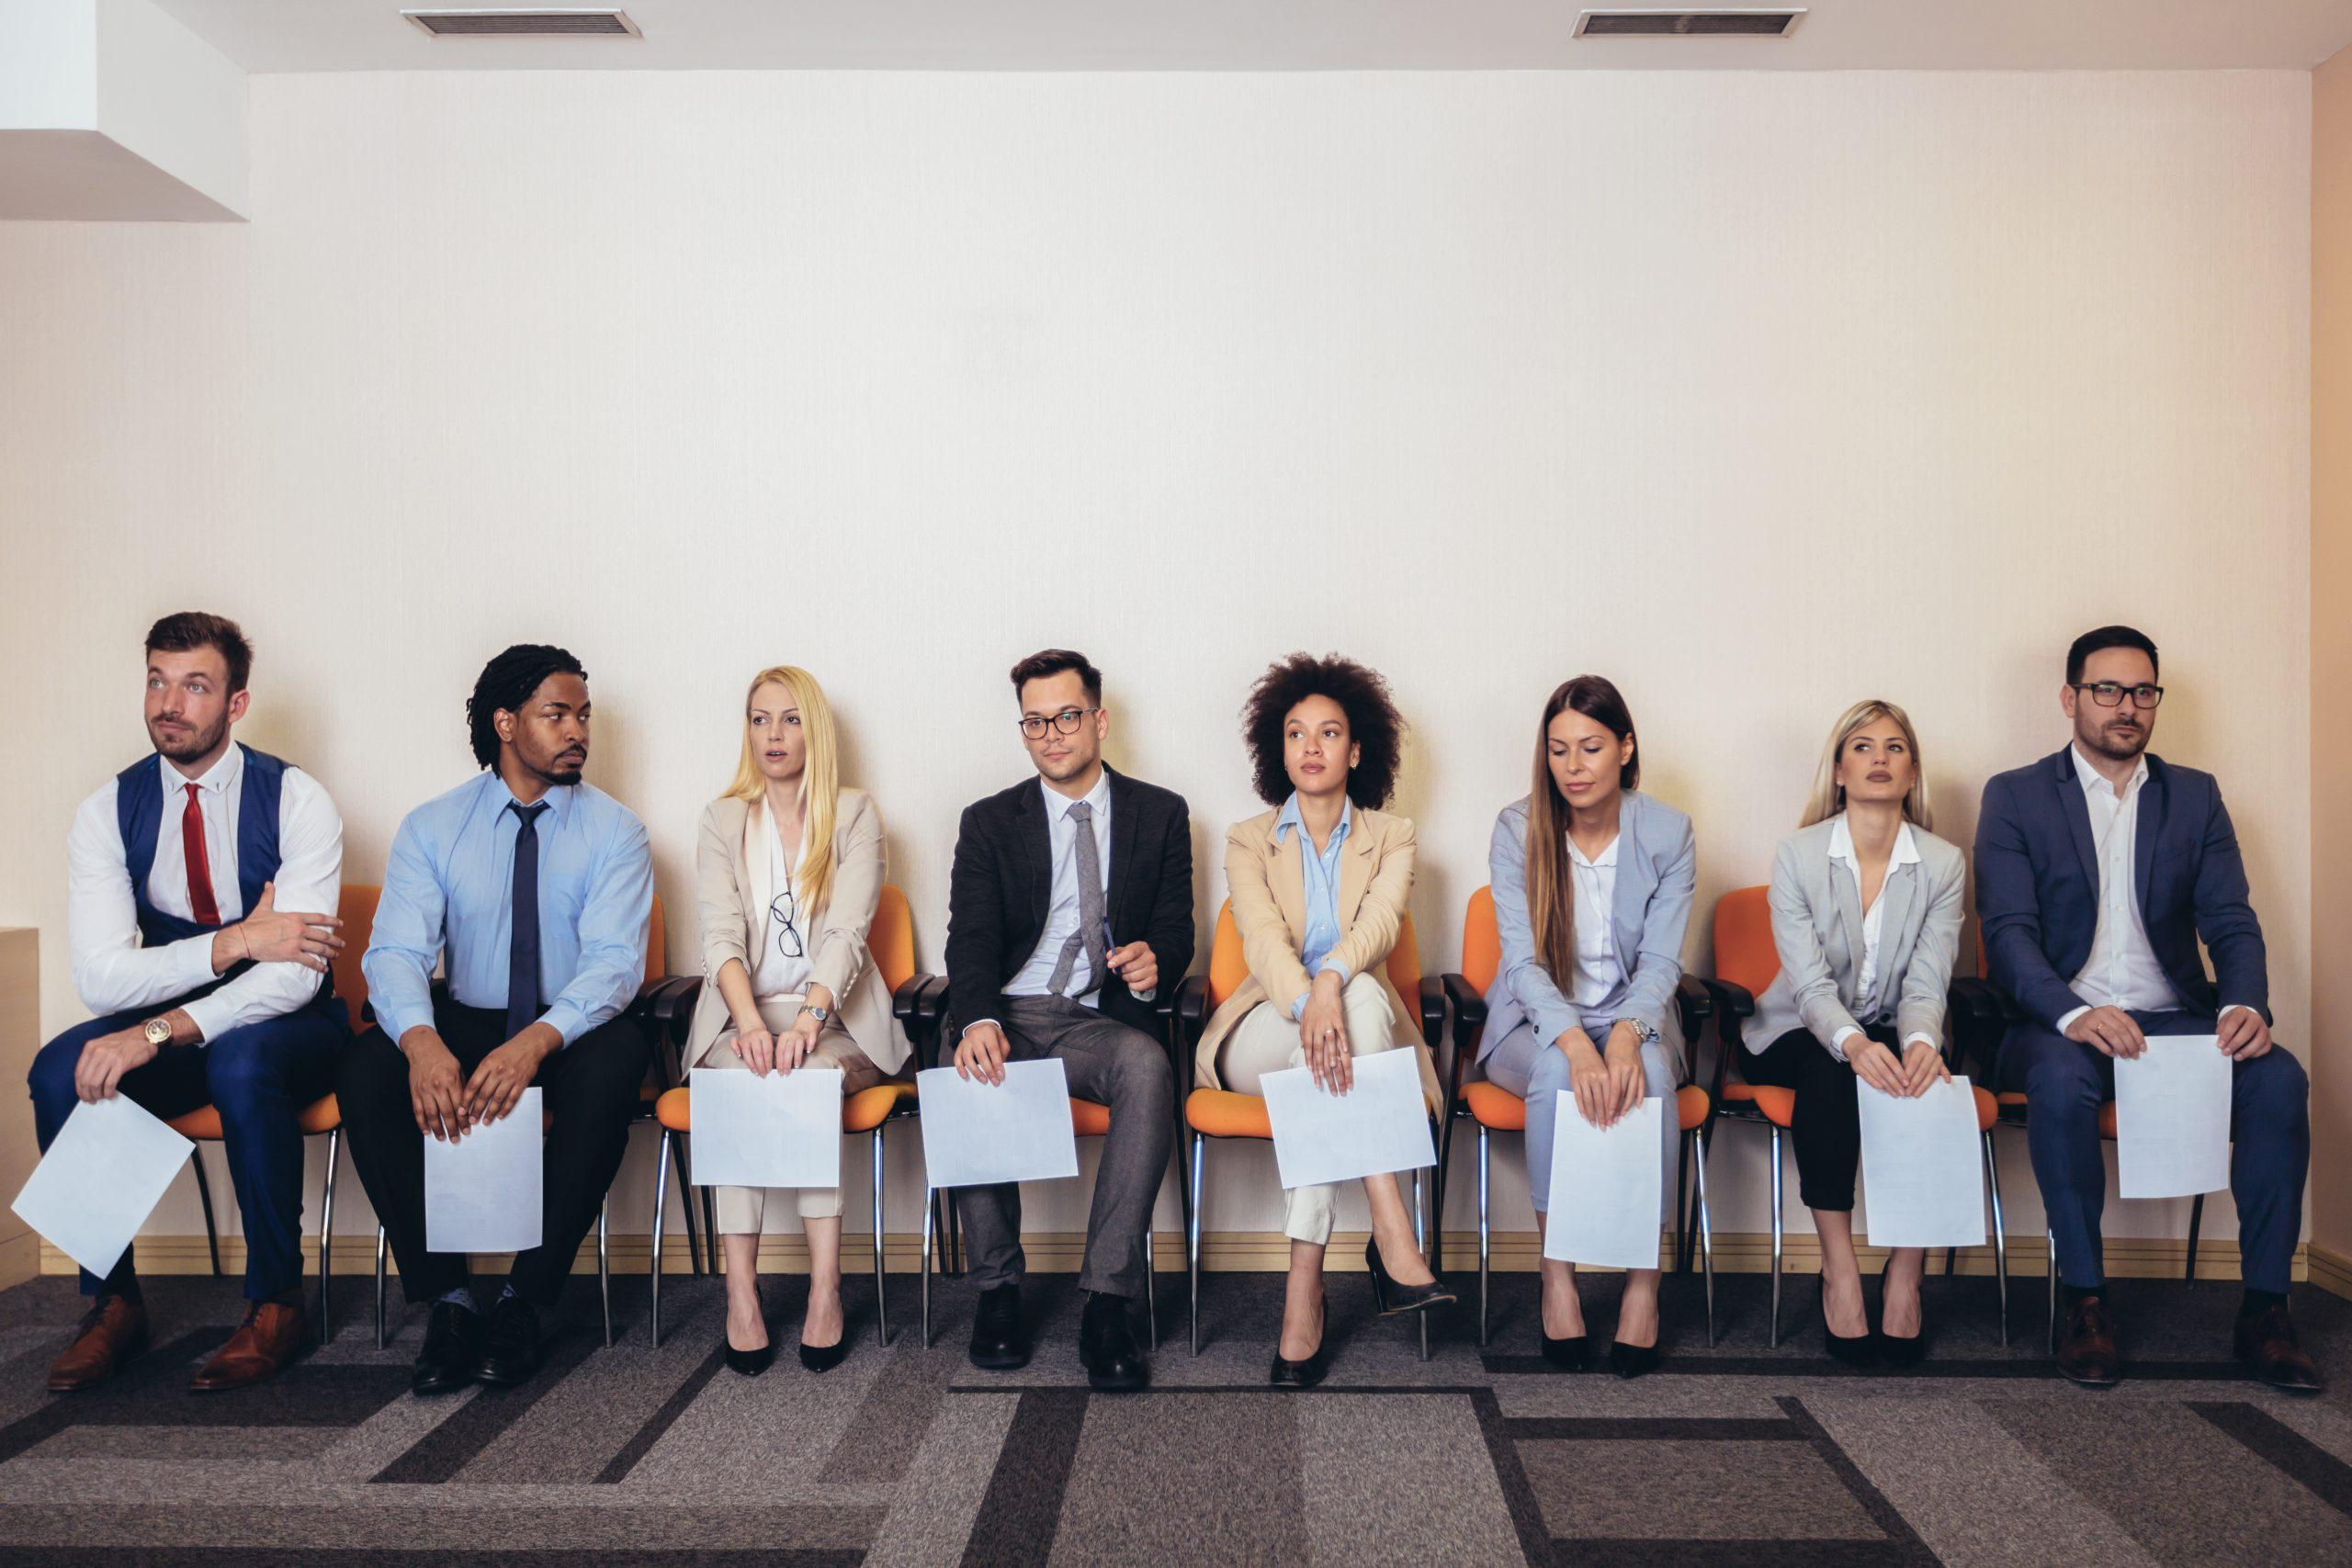 impress hiring managers